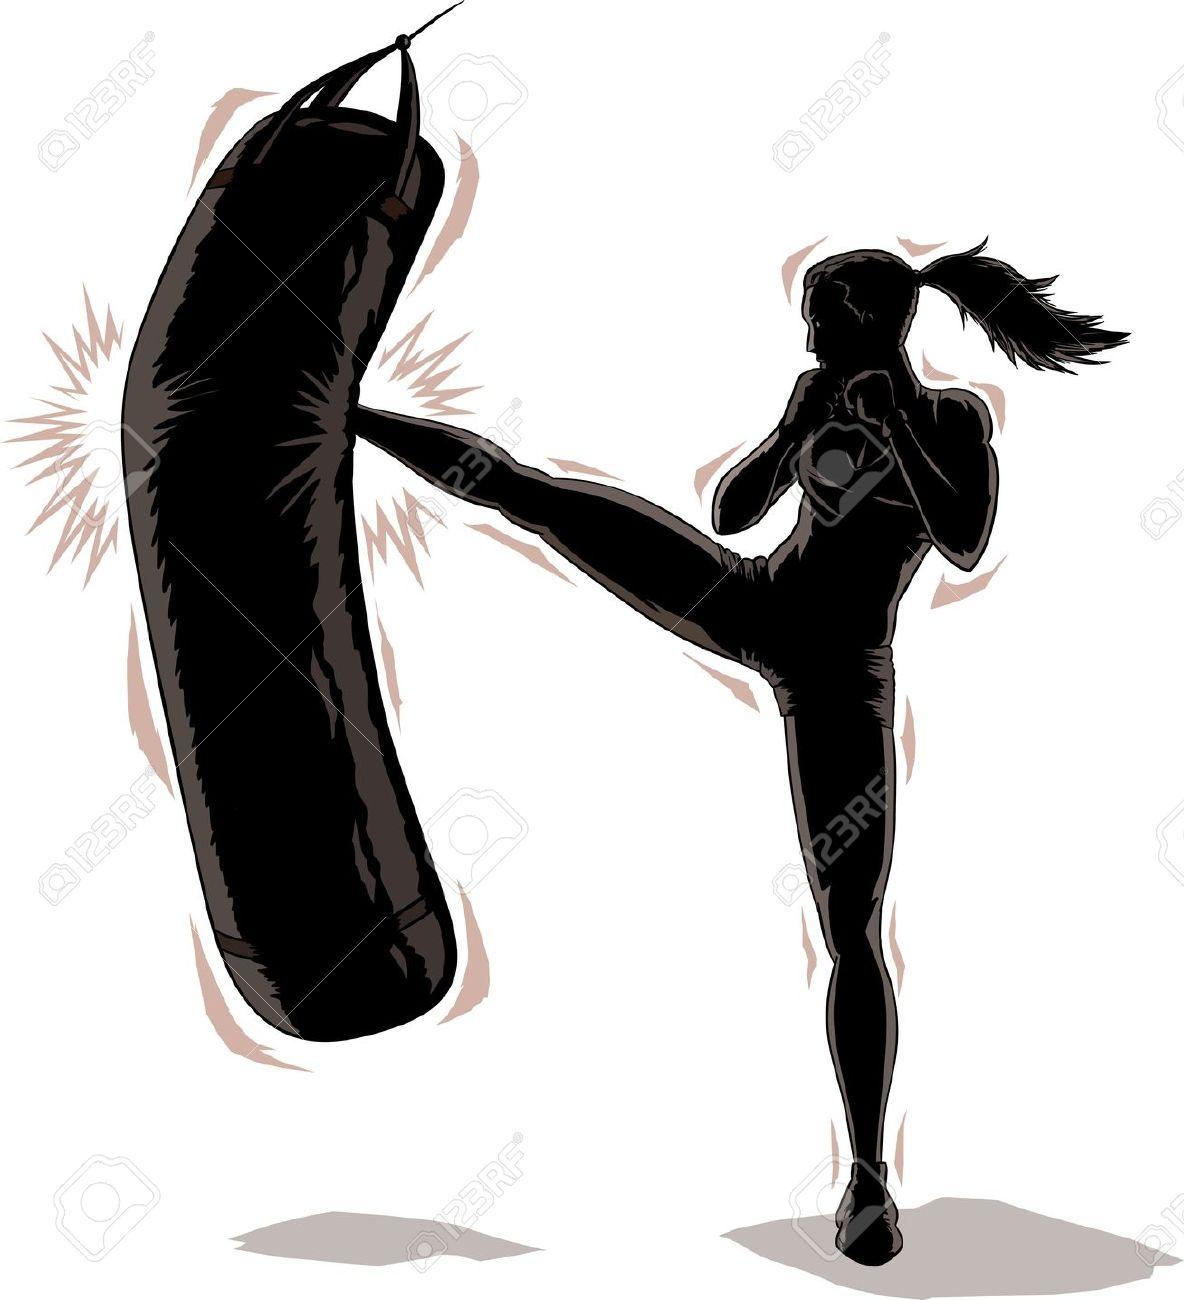 Kickboxer clipart image transparent Kickboxer clipart | Clipart Panda - Free Clipart Images image transparent